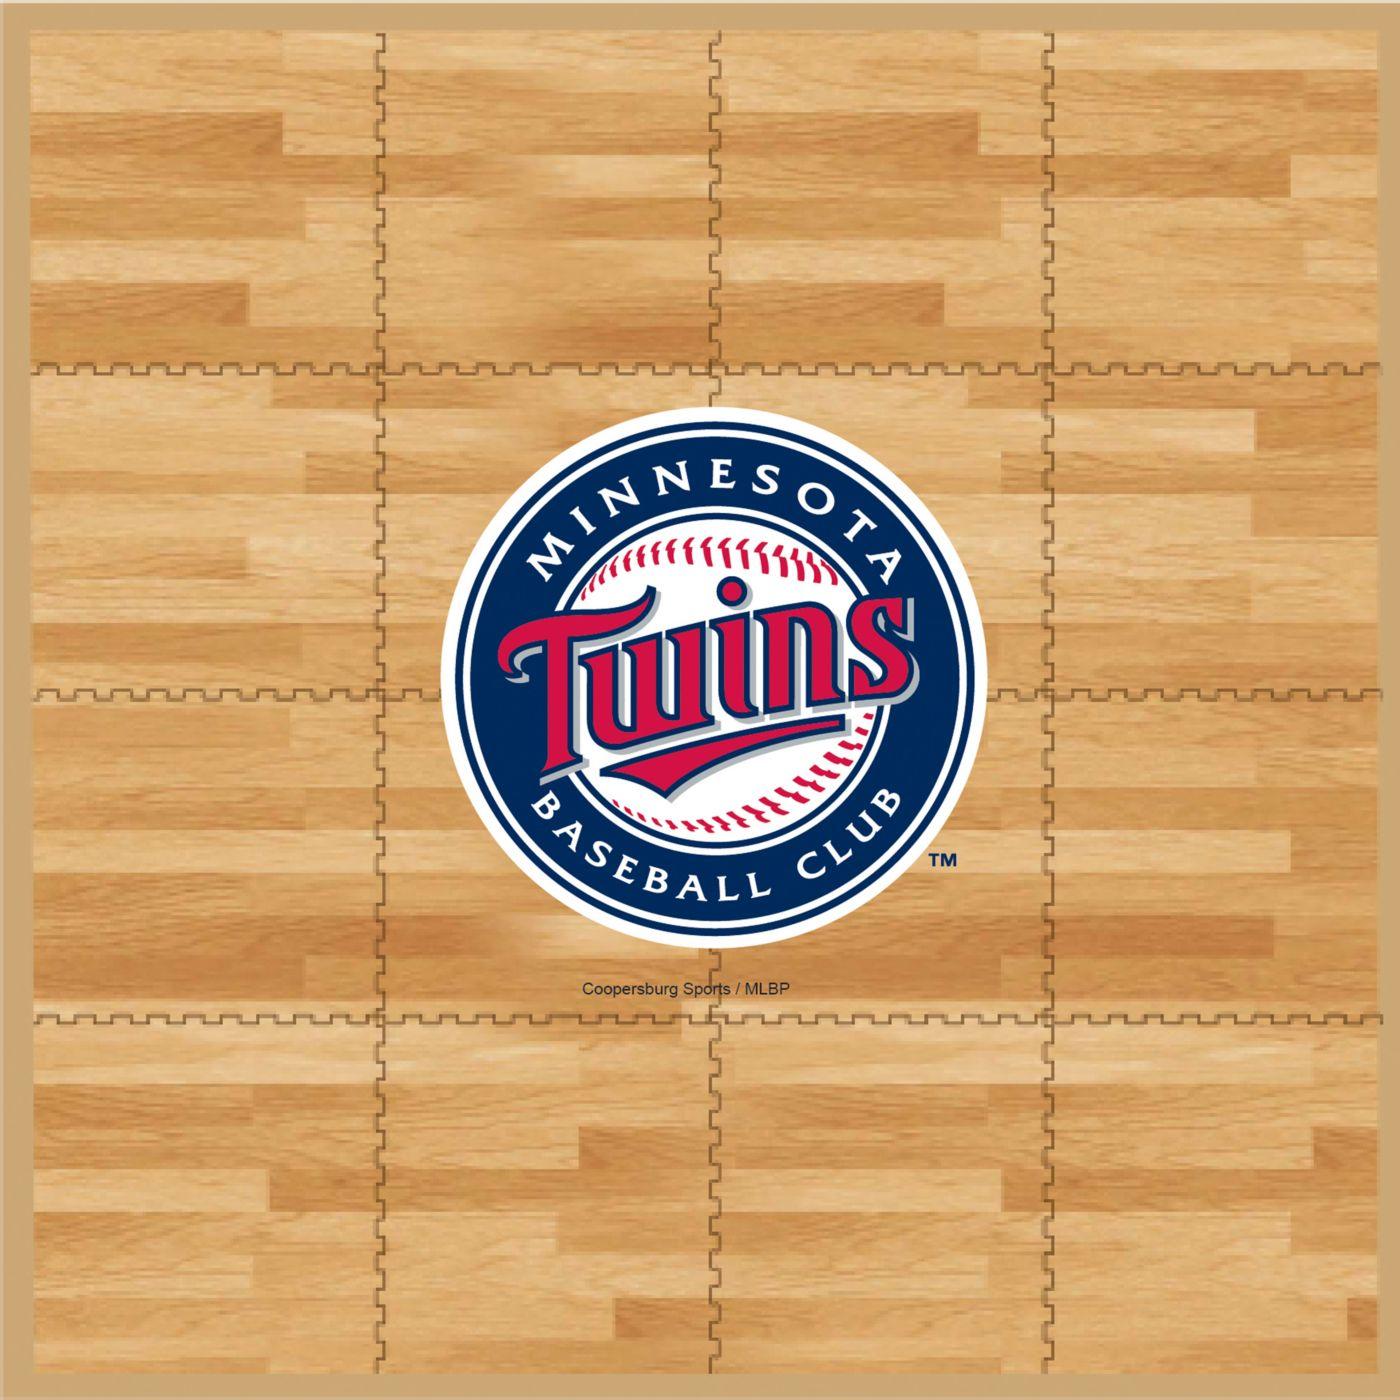 Coopersburg Sports Minnesota Twins Fan Floor